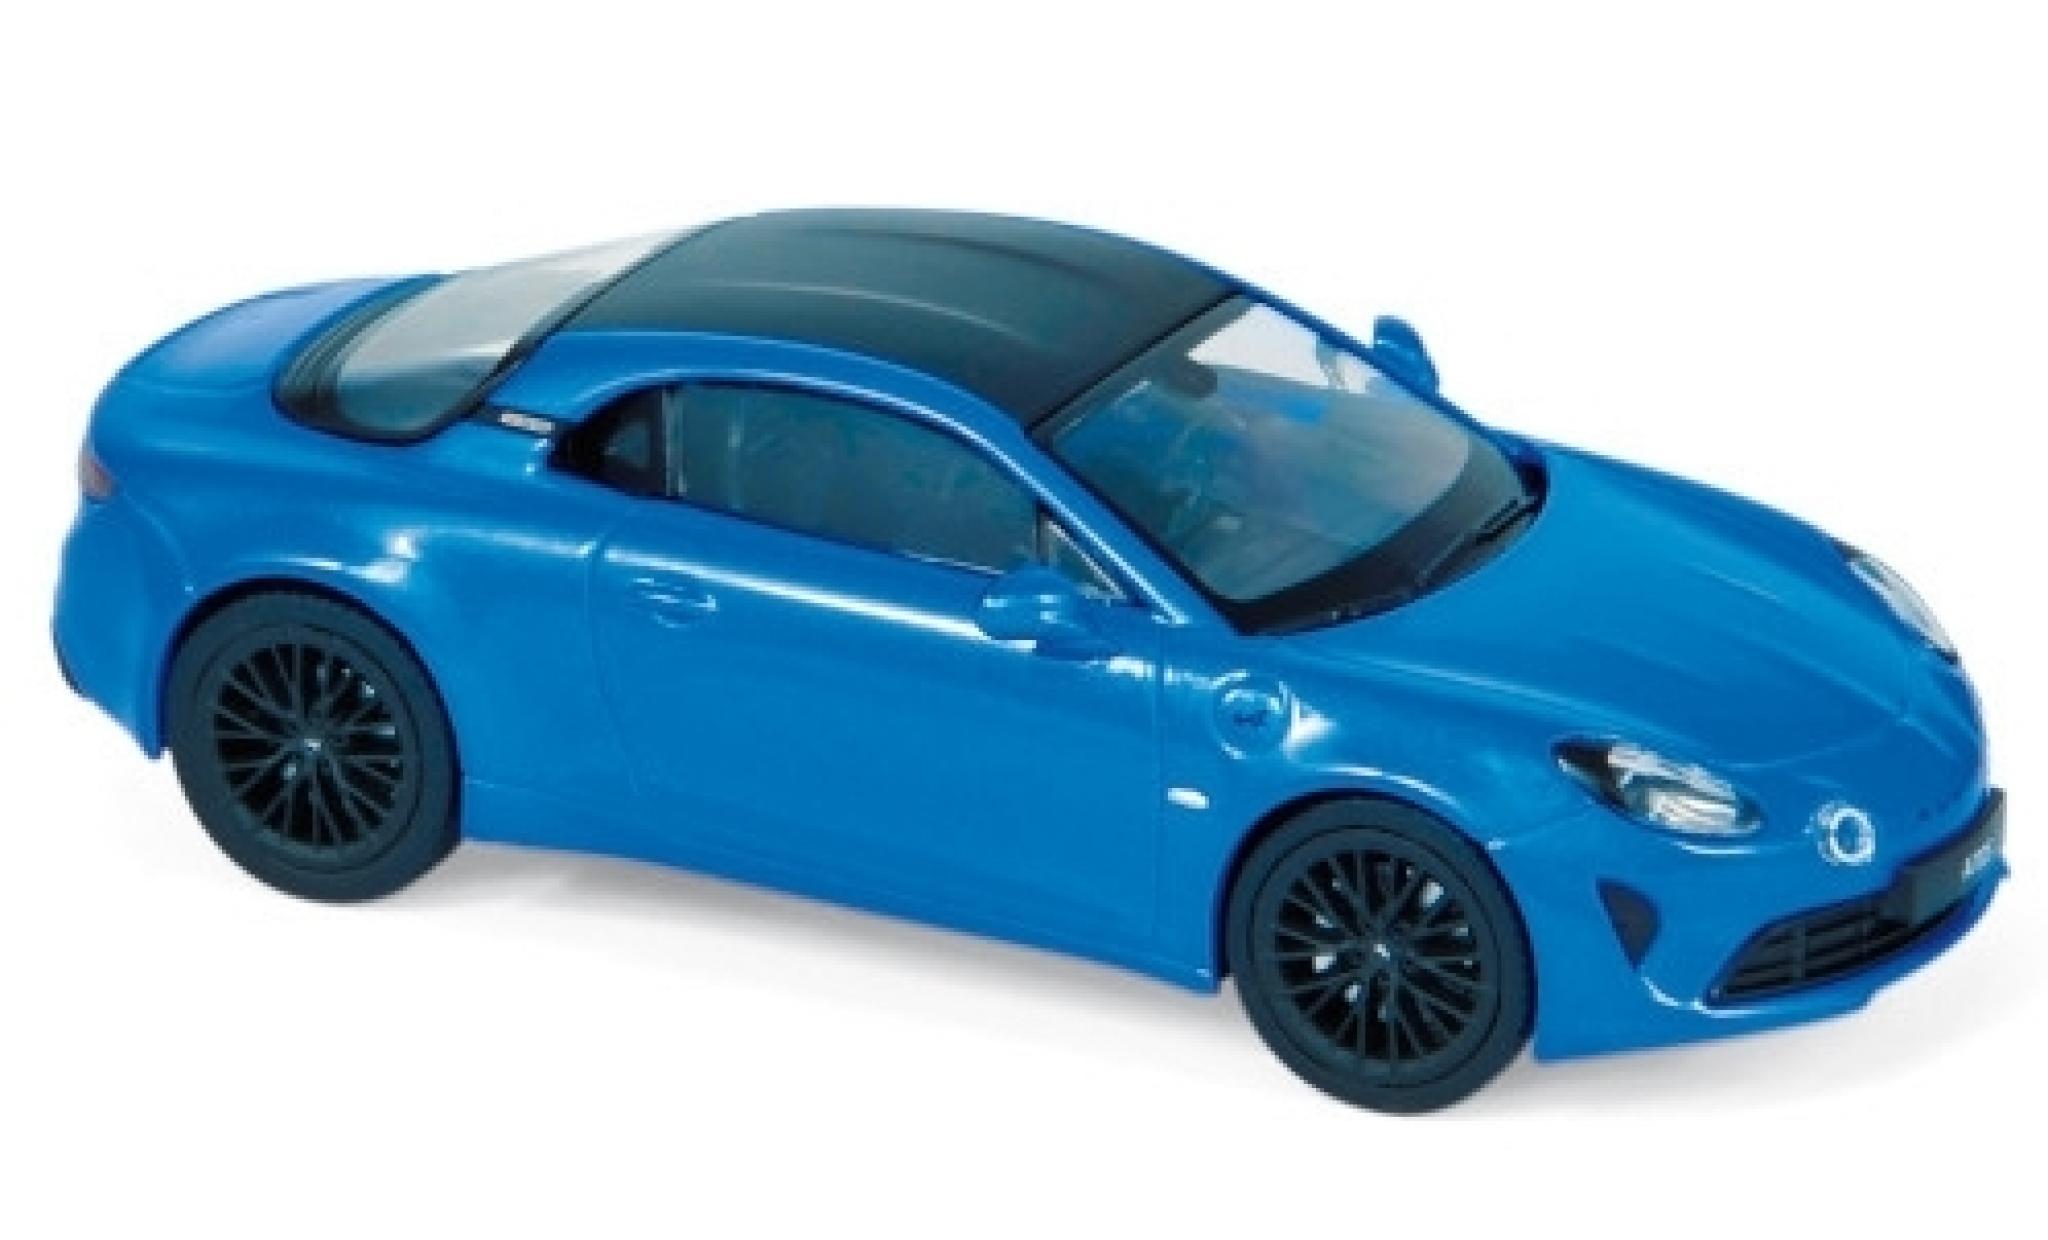 Alpine A110 1/43 Norev S metallise blue/carbon 2019